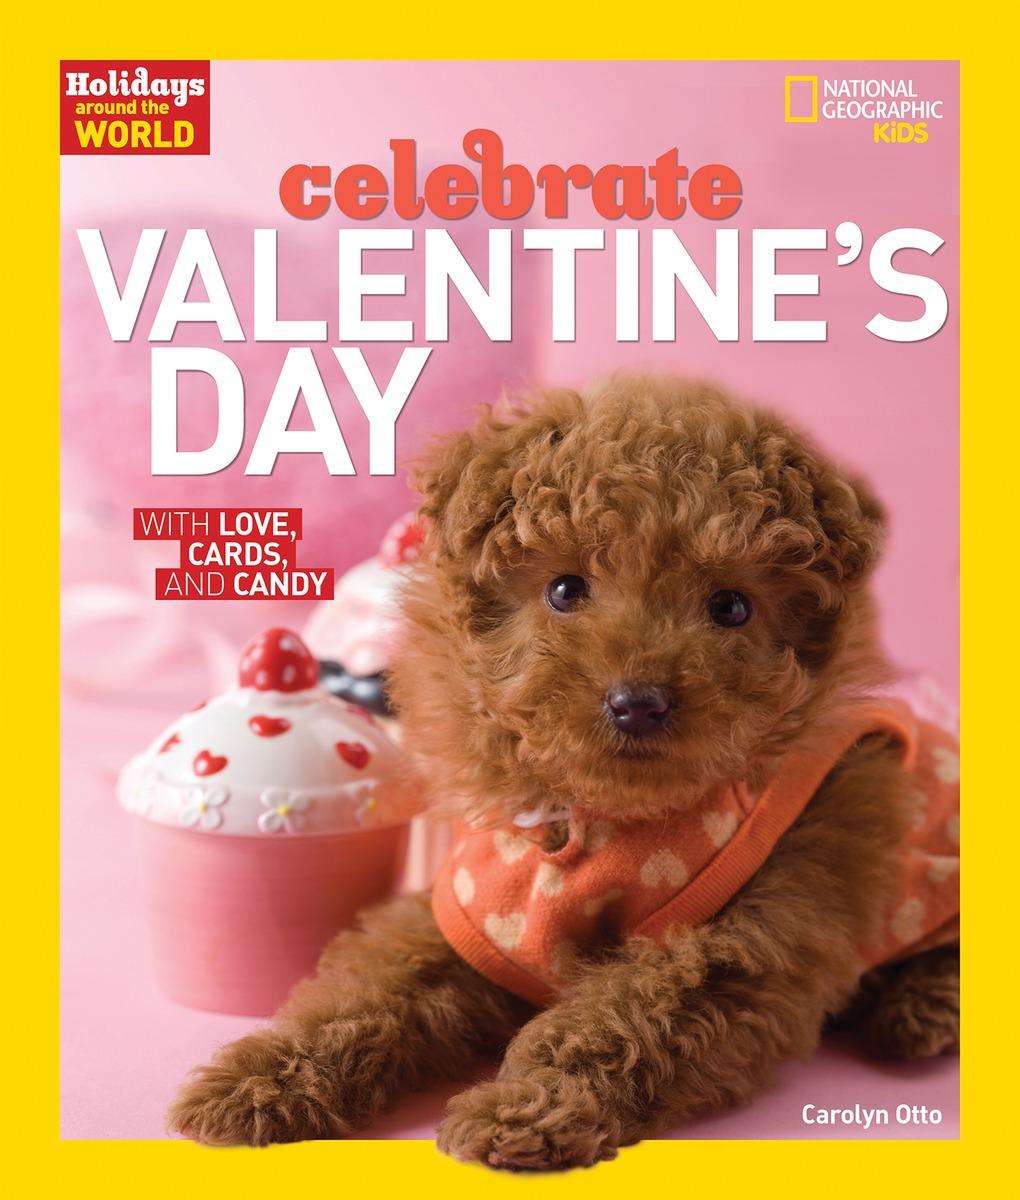 Holidays Around the World: Celebrate Valentine's Day виниловая пластинка prince around the world in a day